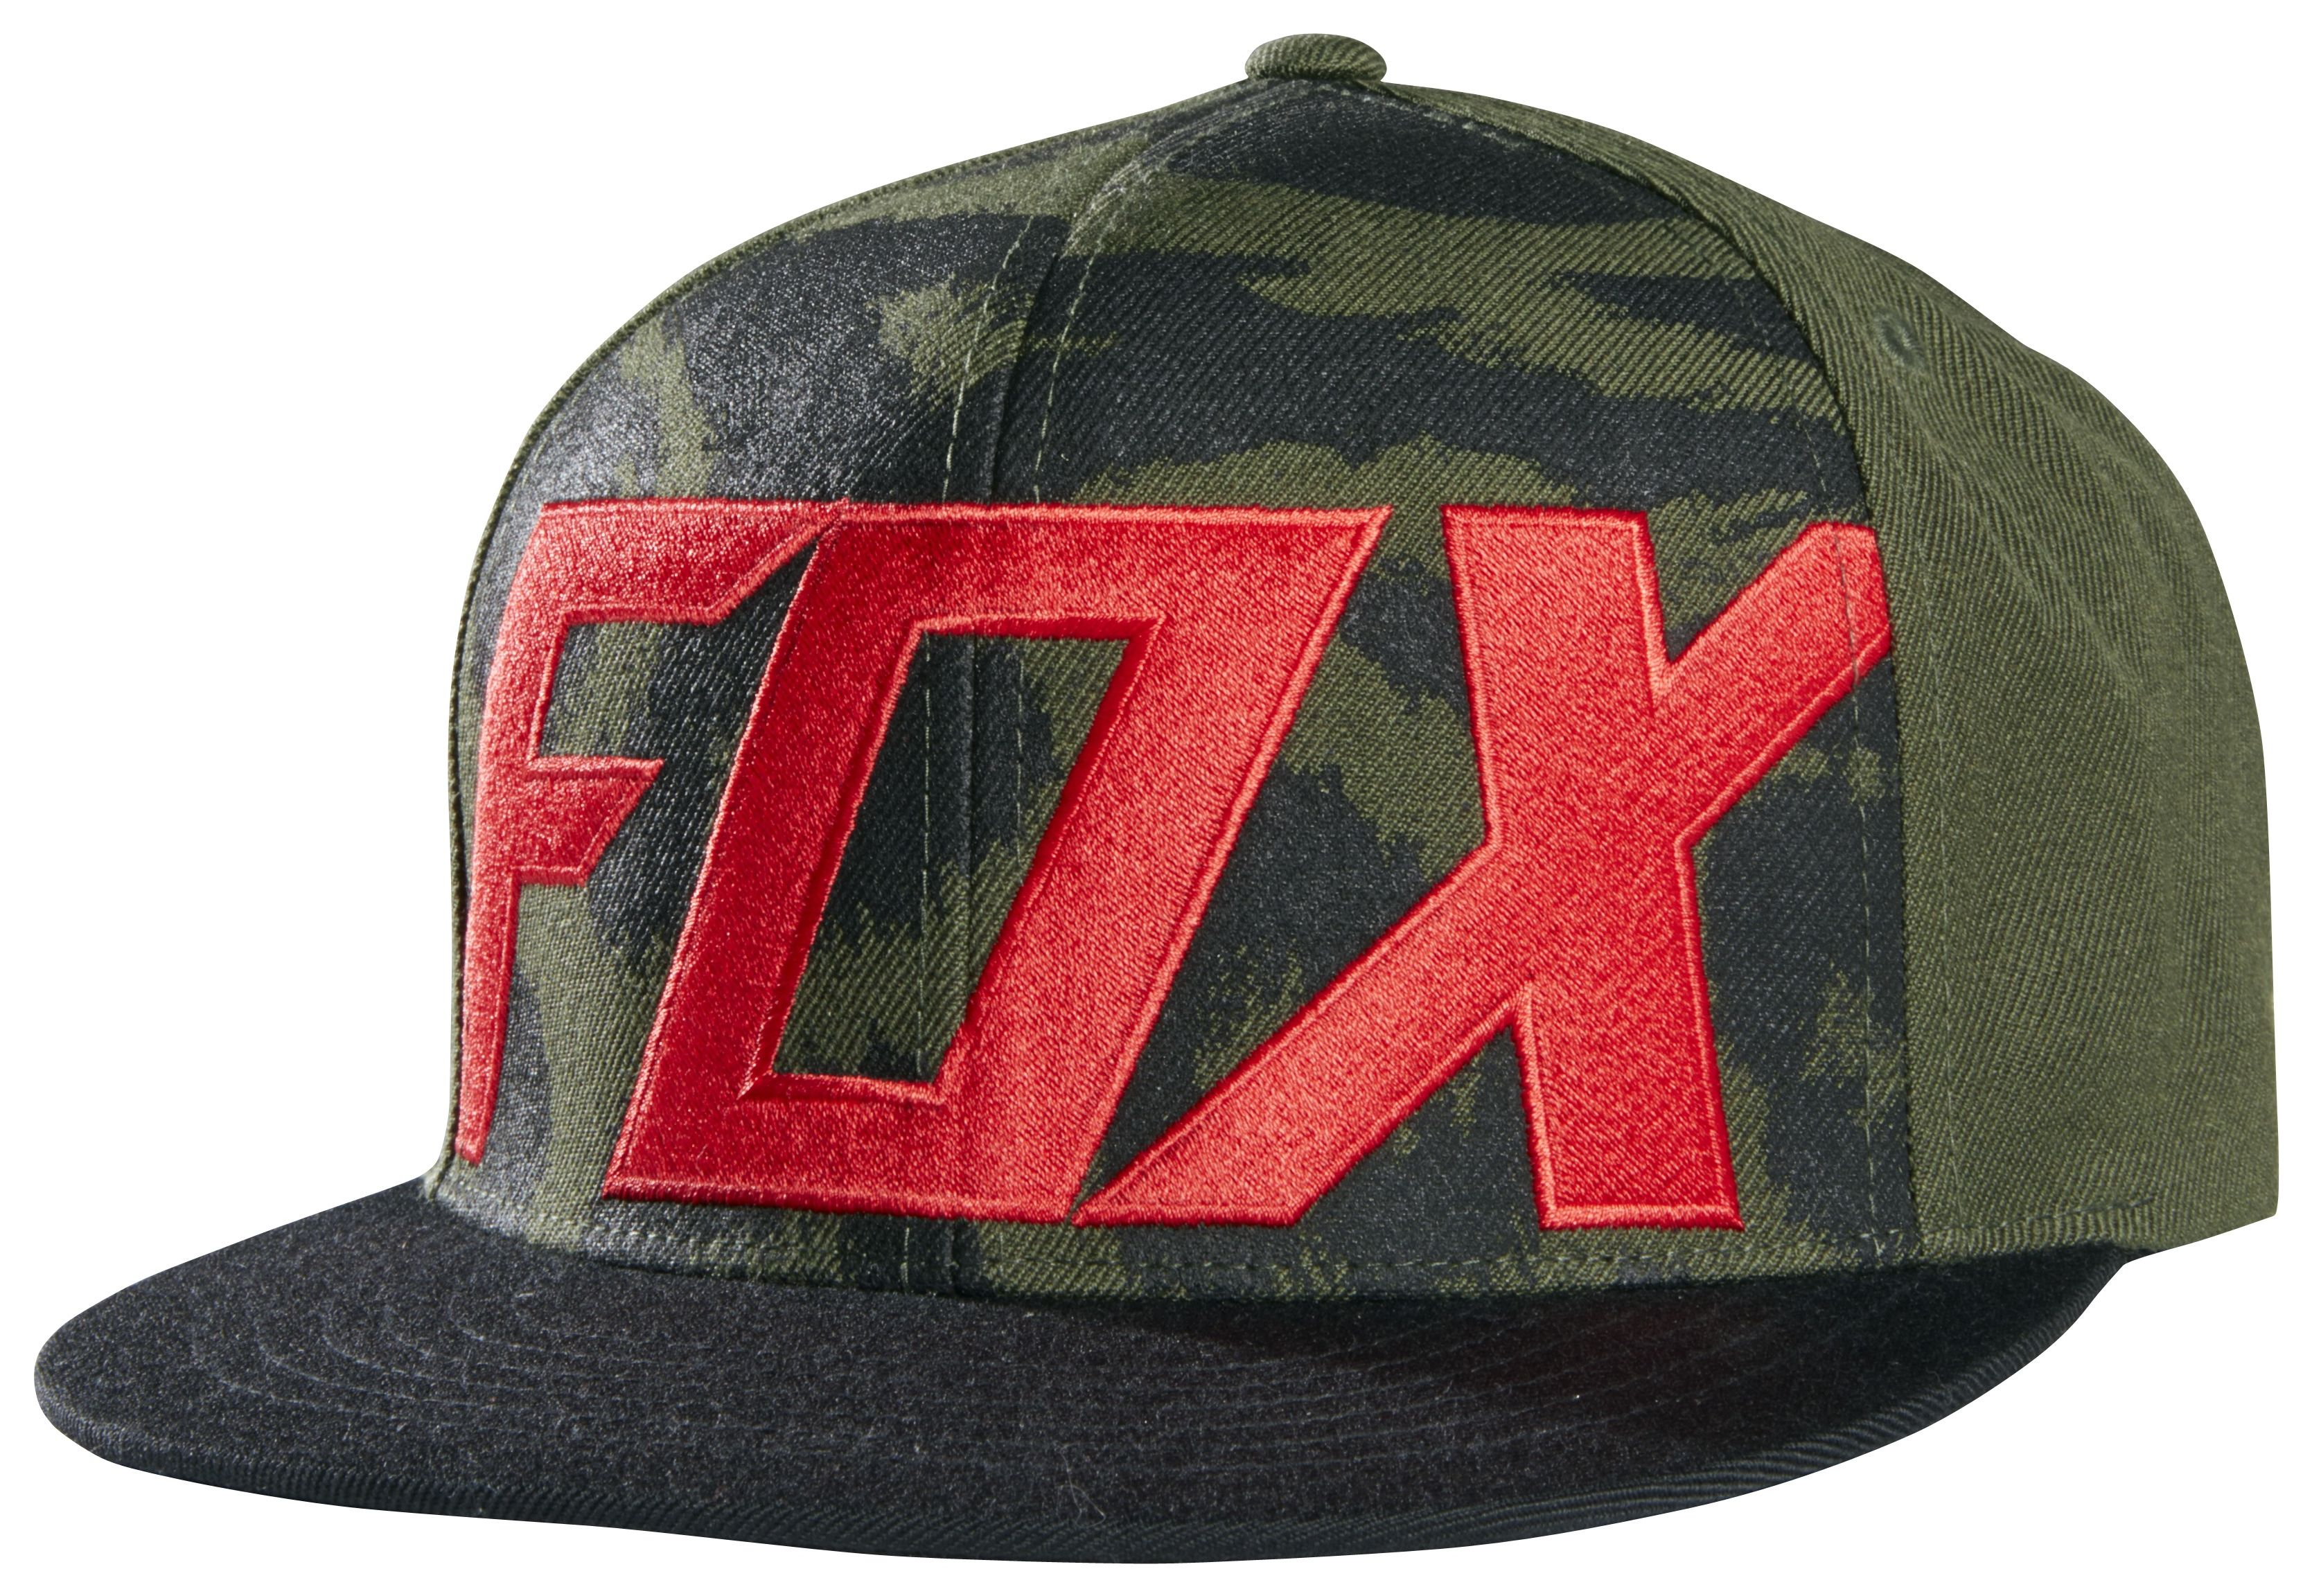 promo code 059bc a38ad new zealand fox racing flex 45 flexfit hat black red f1534 00c7b  denmark fox  racing marz sx15 sd le snapback hat revzilla 7181b 56861